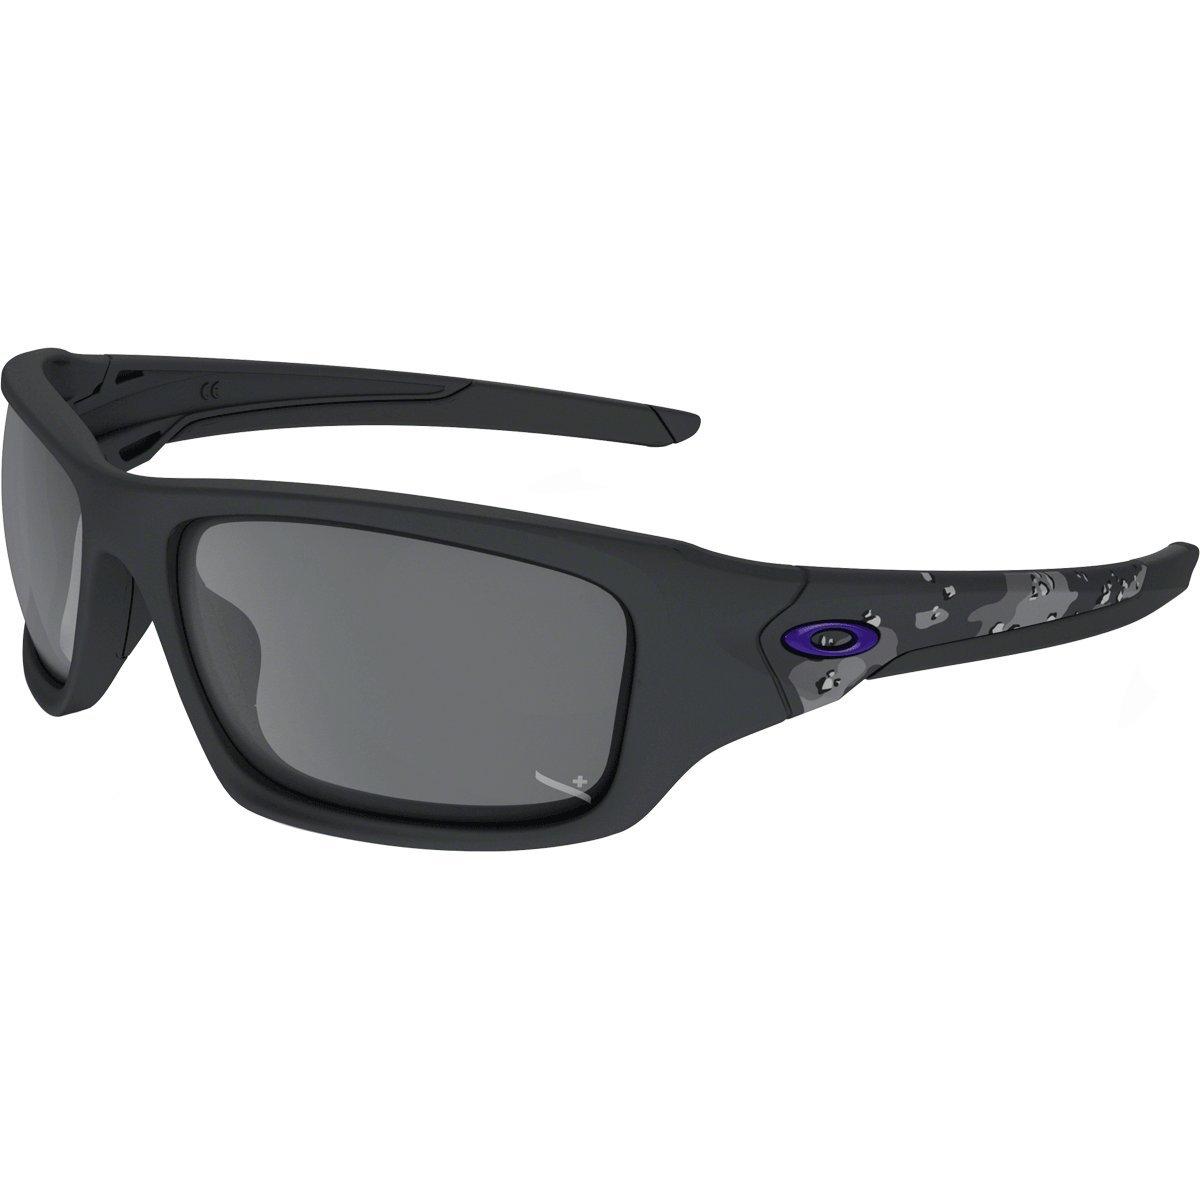 Oakley Men's Valve Rectangular, Carbon, 60 mm by Oakley